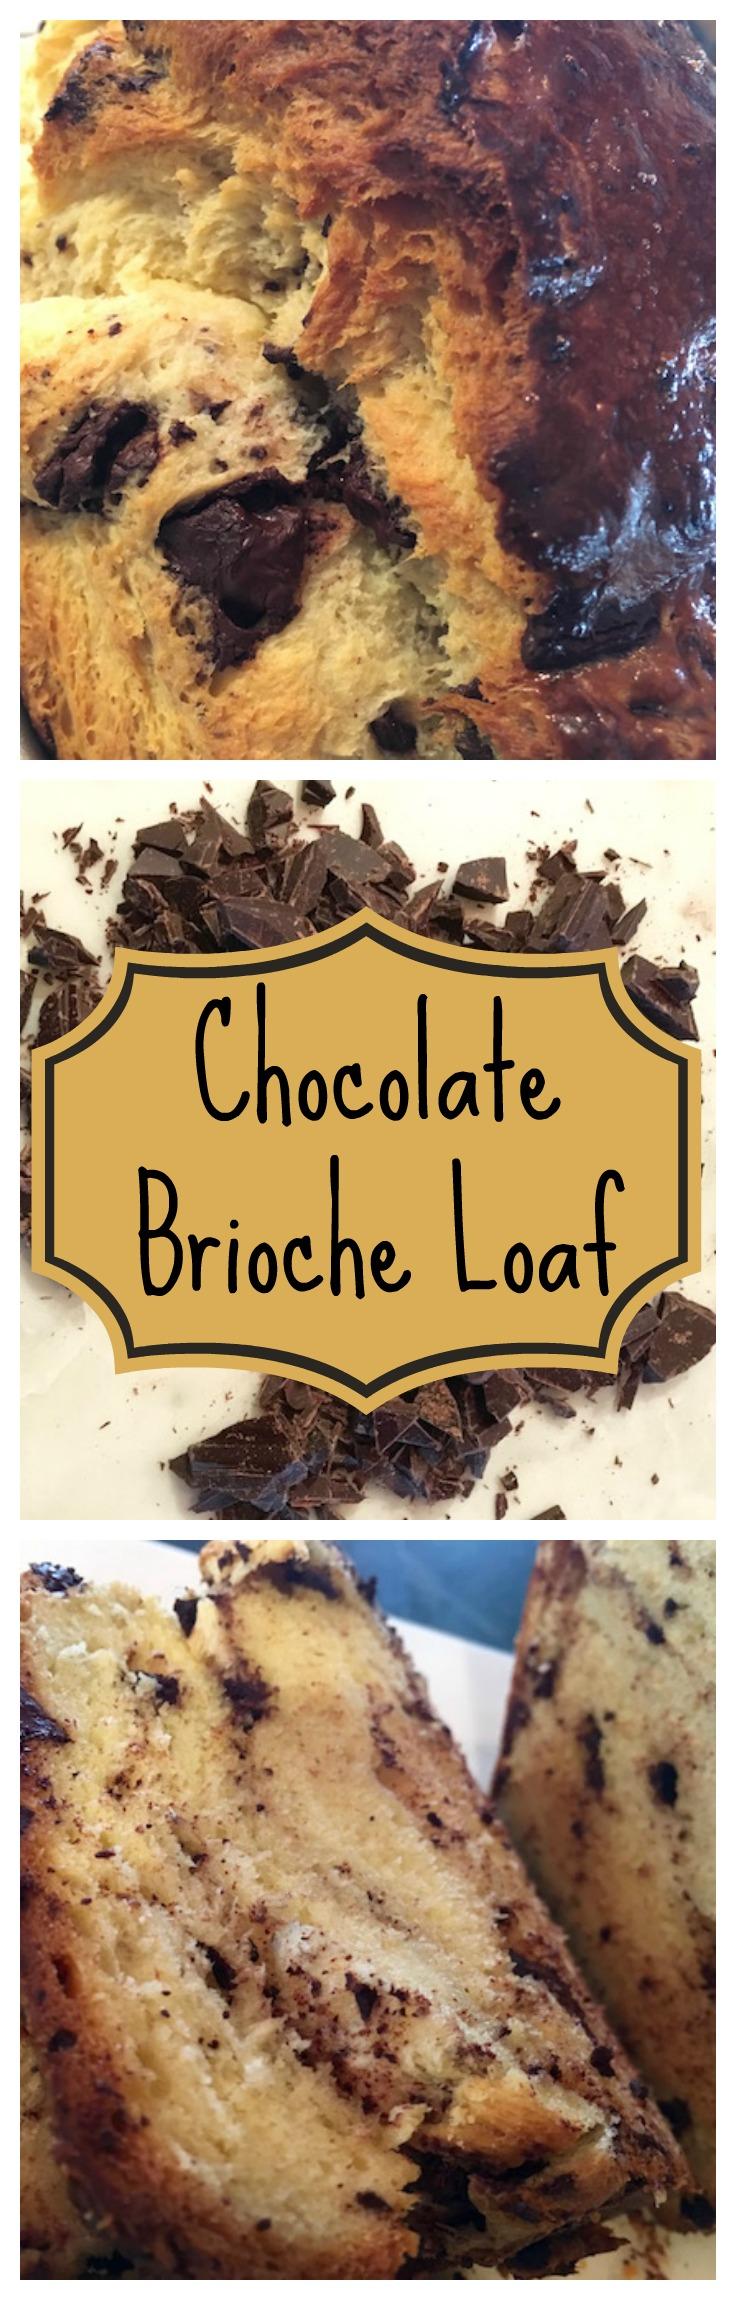 Chocolate Brioche Loaf - DeliciousPerspective.com